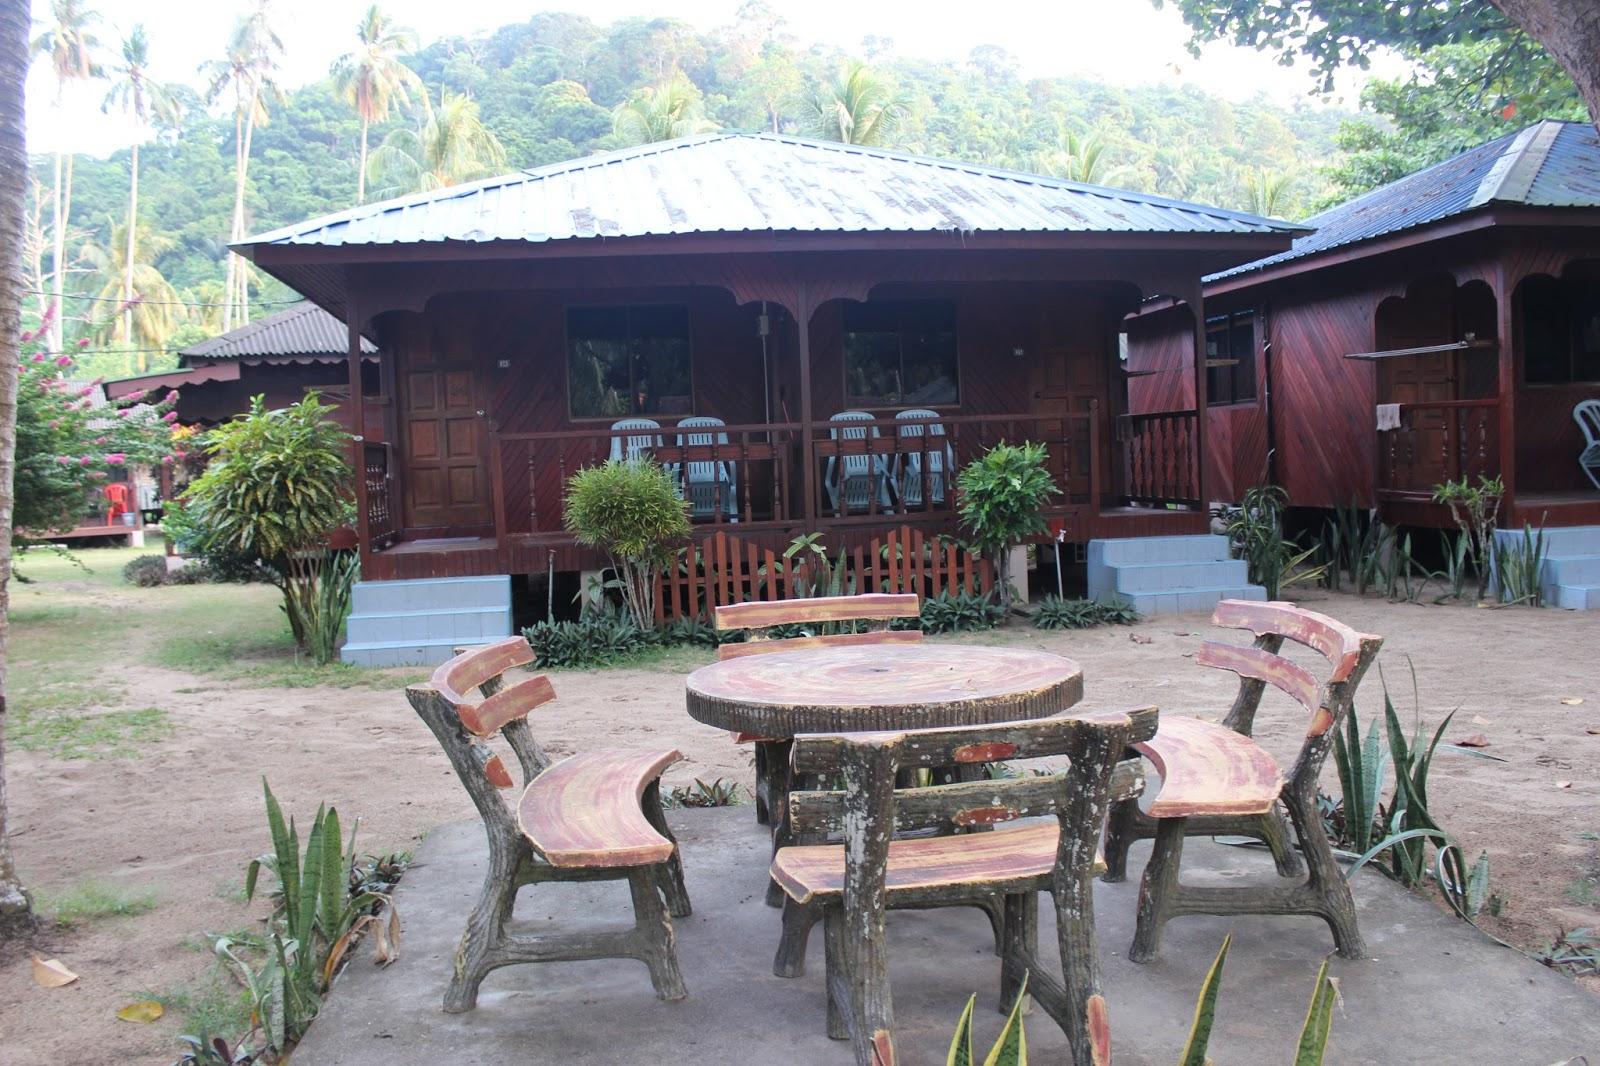 pakej-pulau-tioman-salang-pusaka-surrounding-15